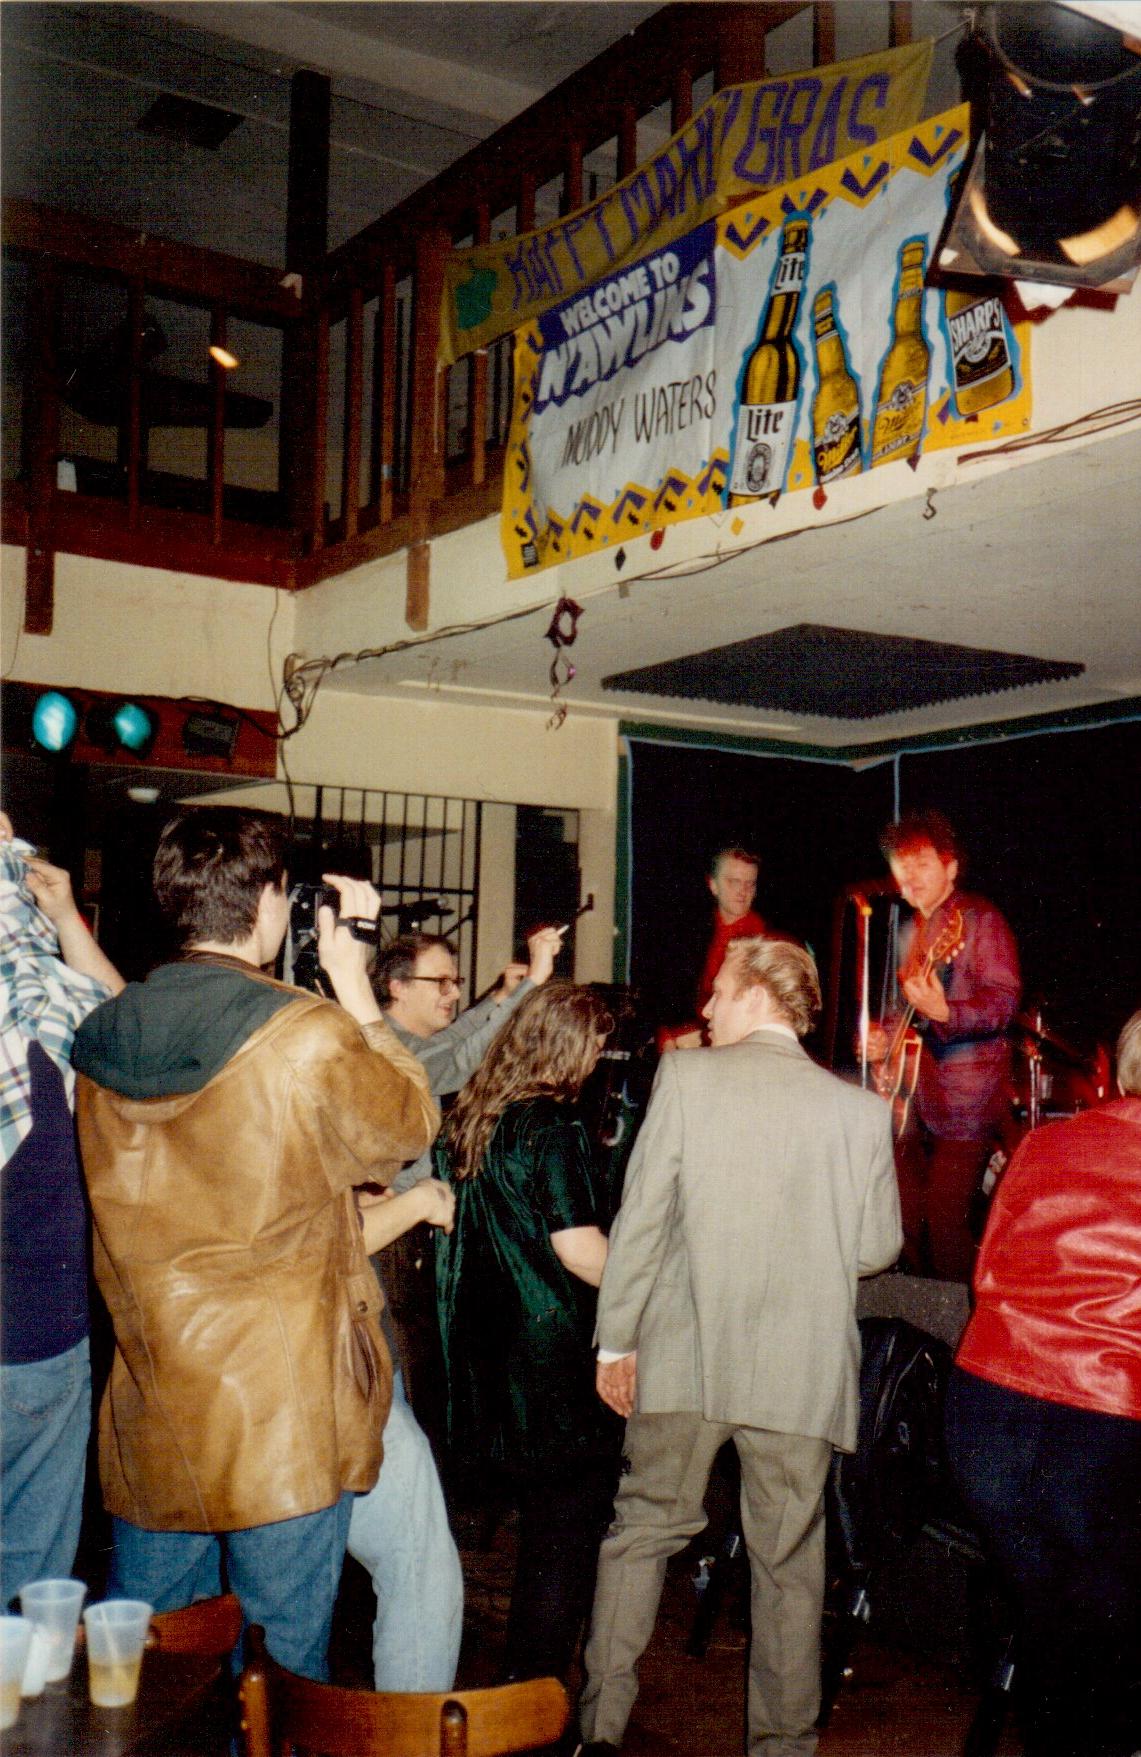 Tav Falco at Muddy Waters Mardi Gras 1993